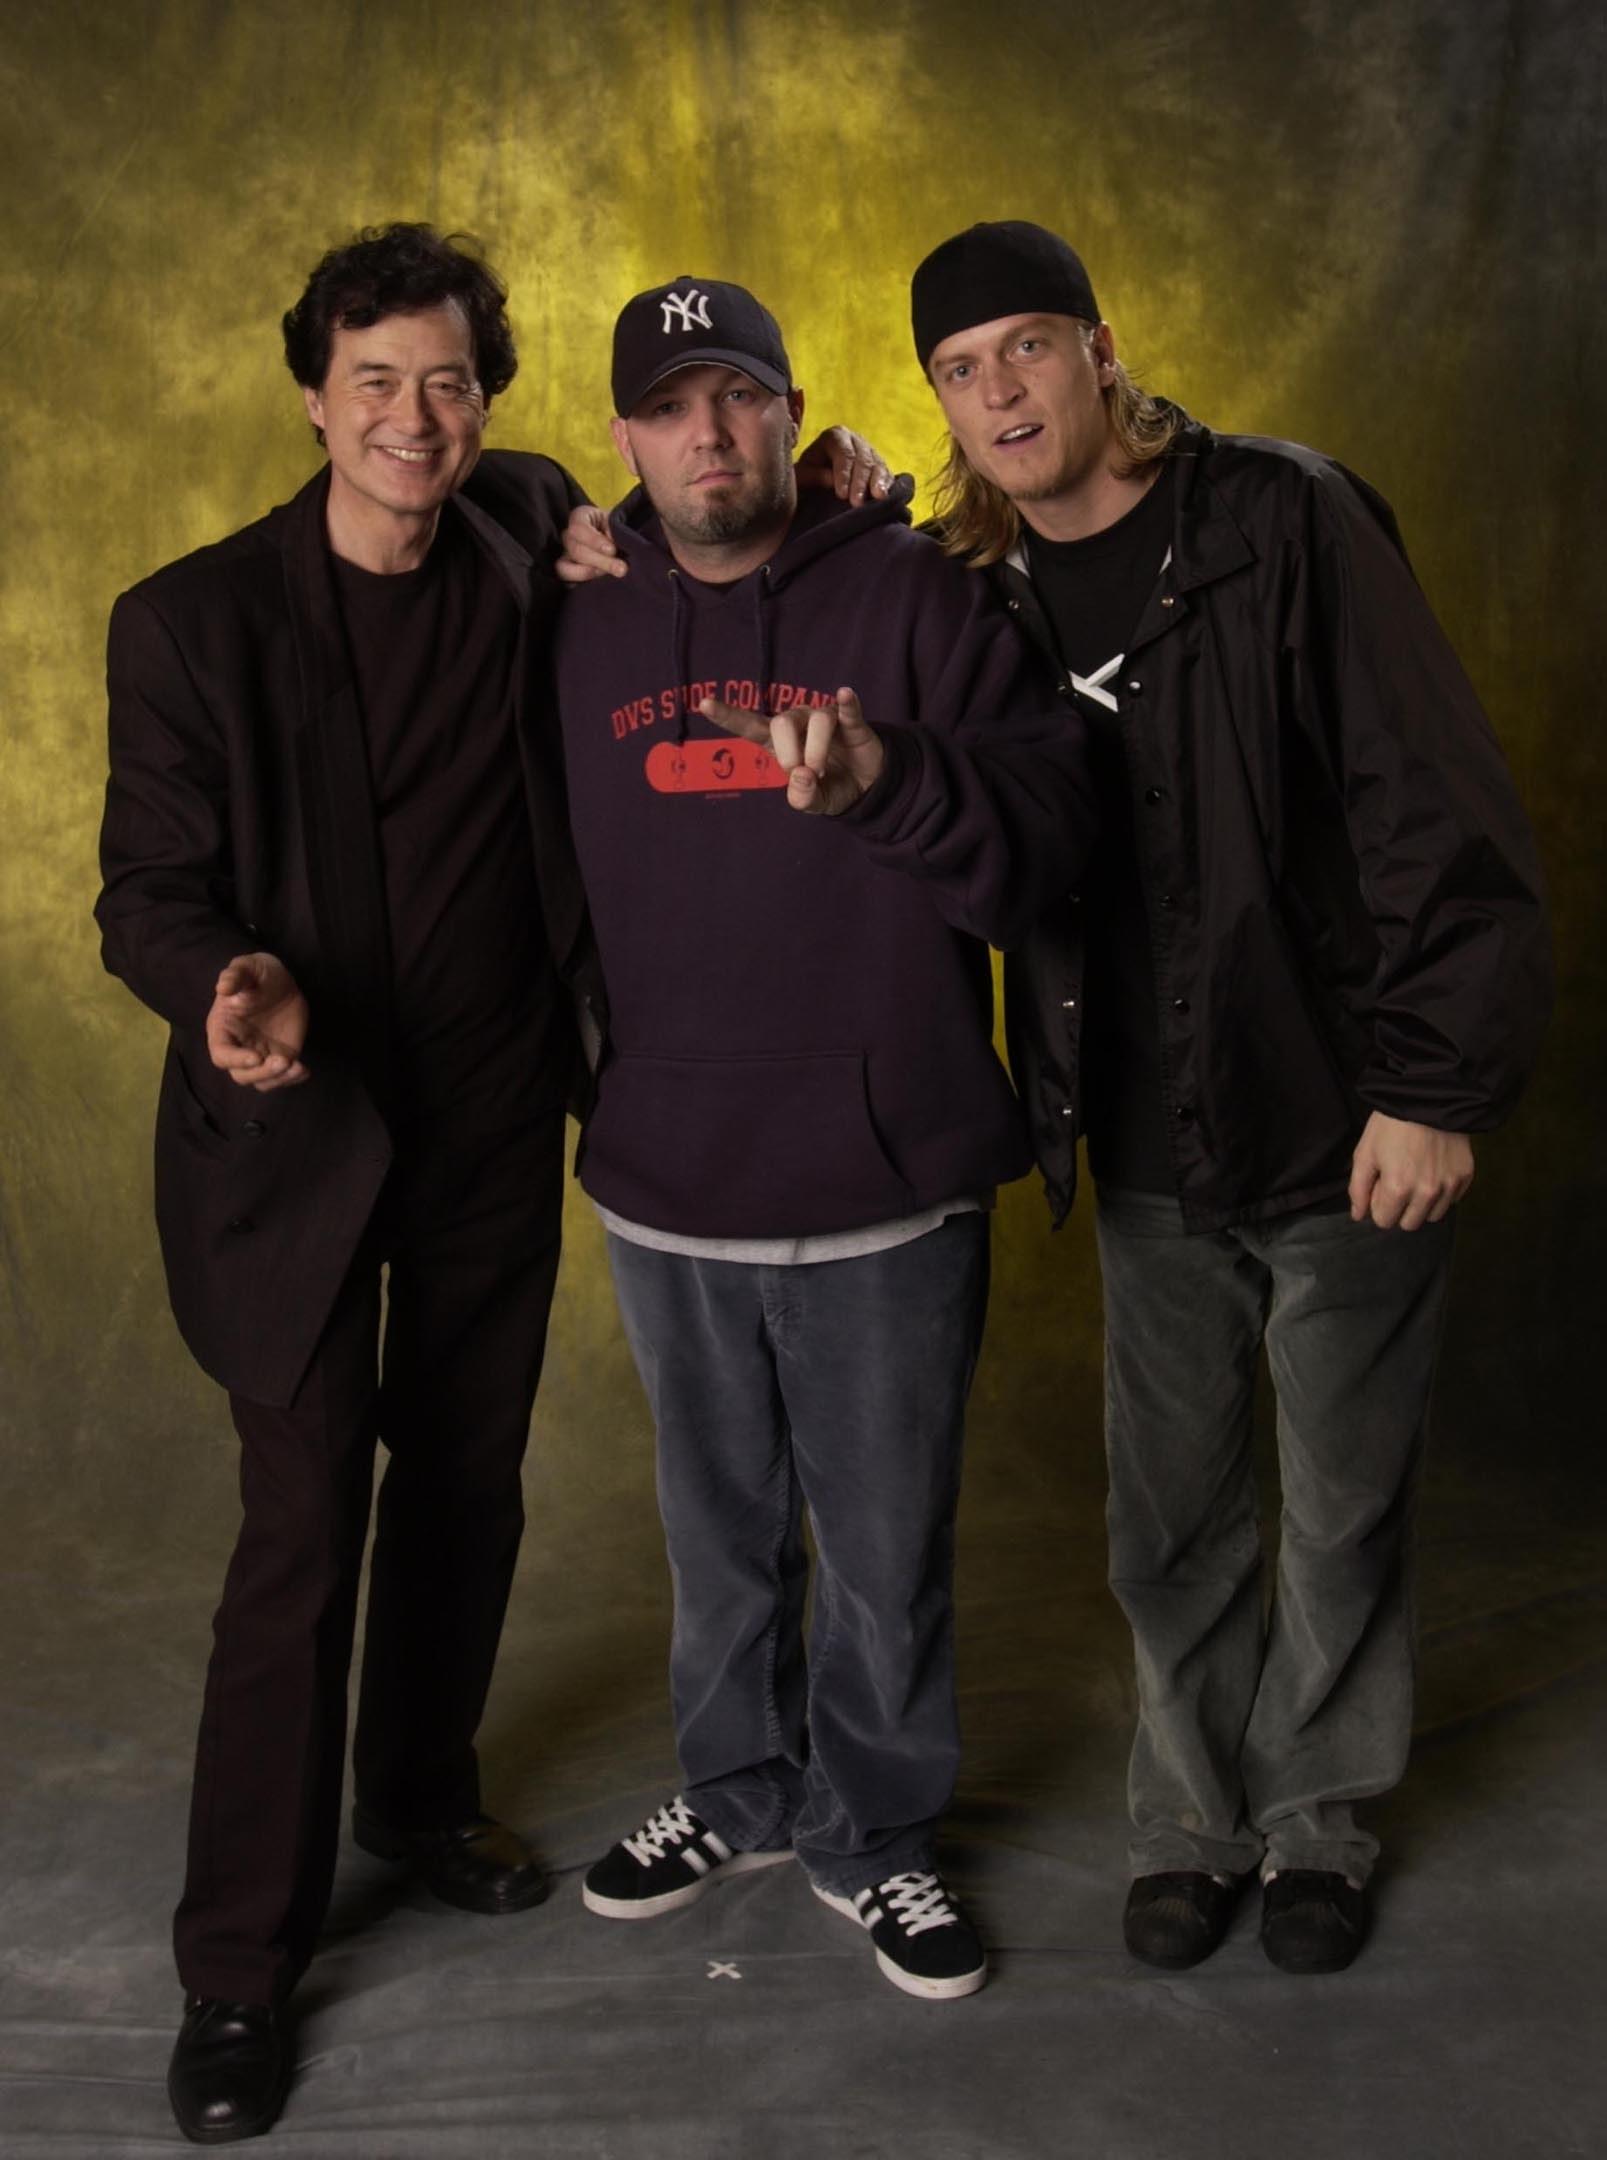 the group limp bizkit in 2001